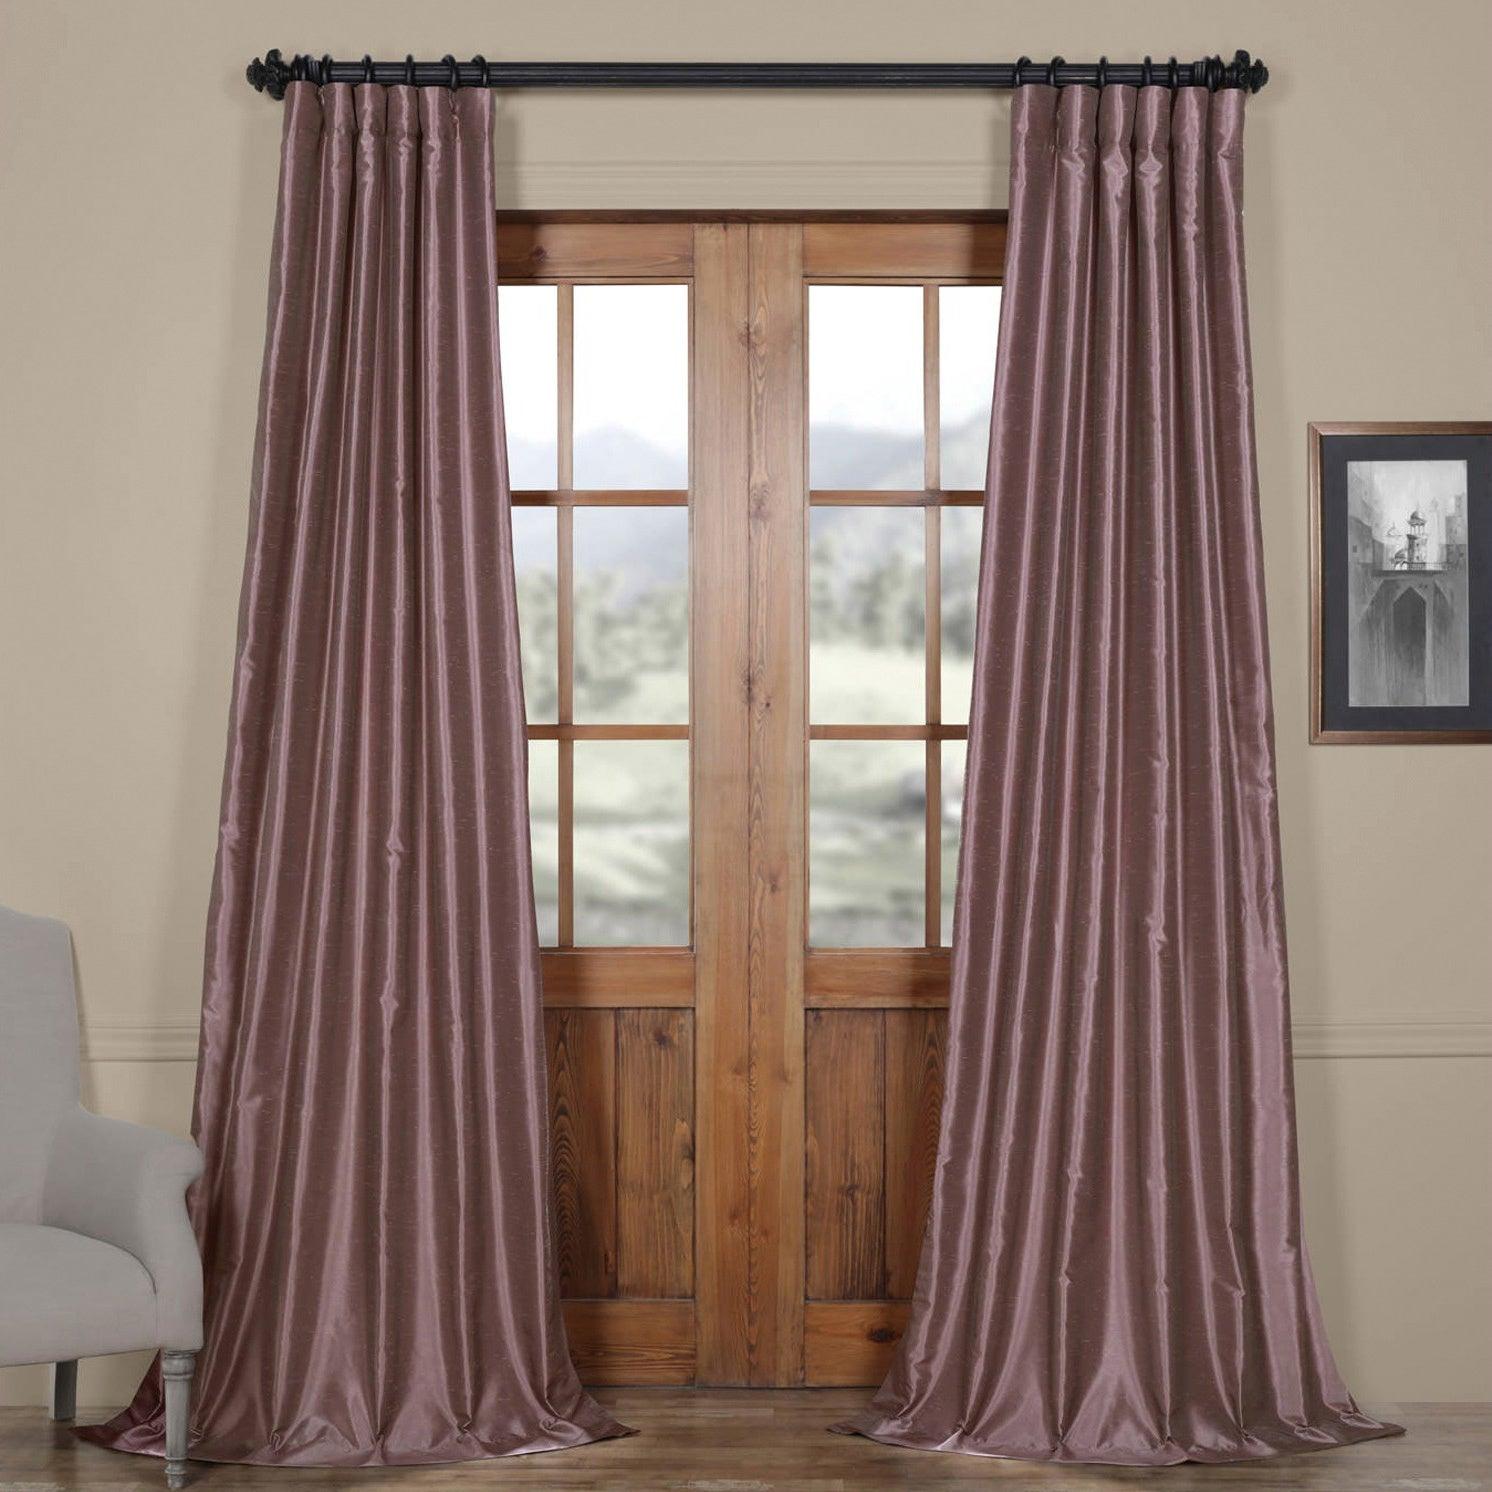 Eff Smoky Plum Vintage Faux Dupioni Silk Curtain Panel With Regard To True Blackout Vintage Textured Faux Silk Curtain Panels (View 19 of 30)